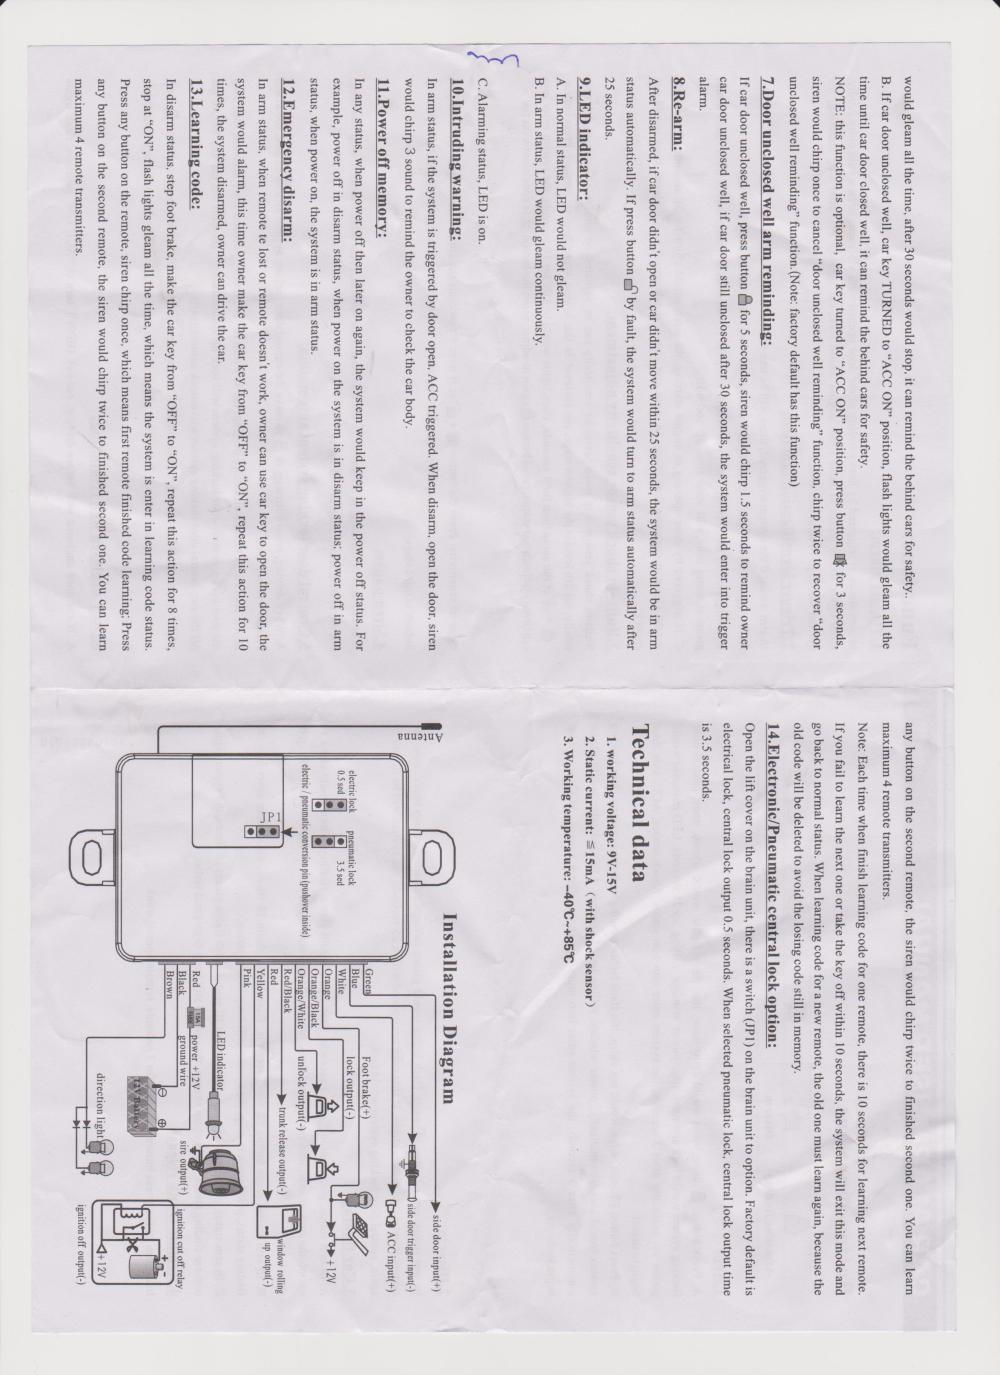 medium resolution of car security installation diagram